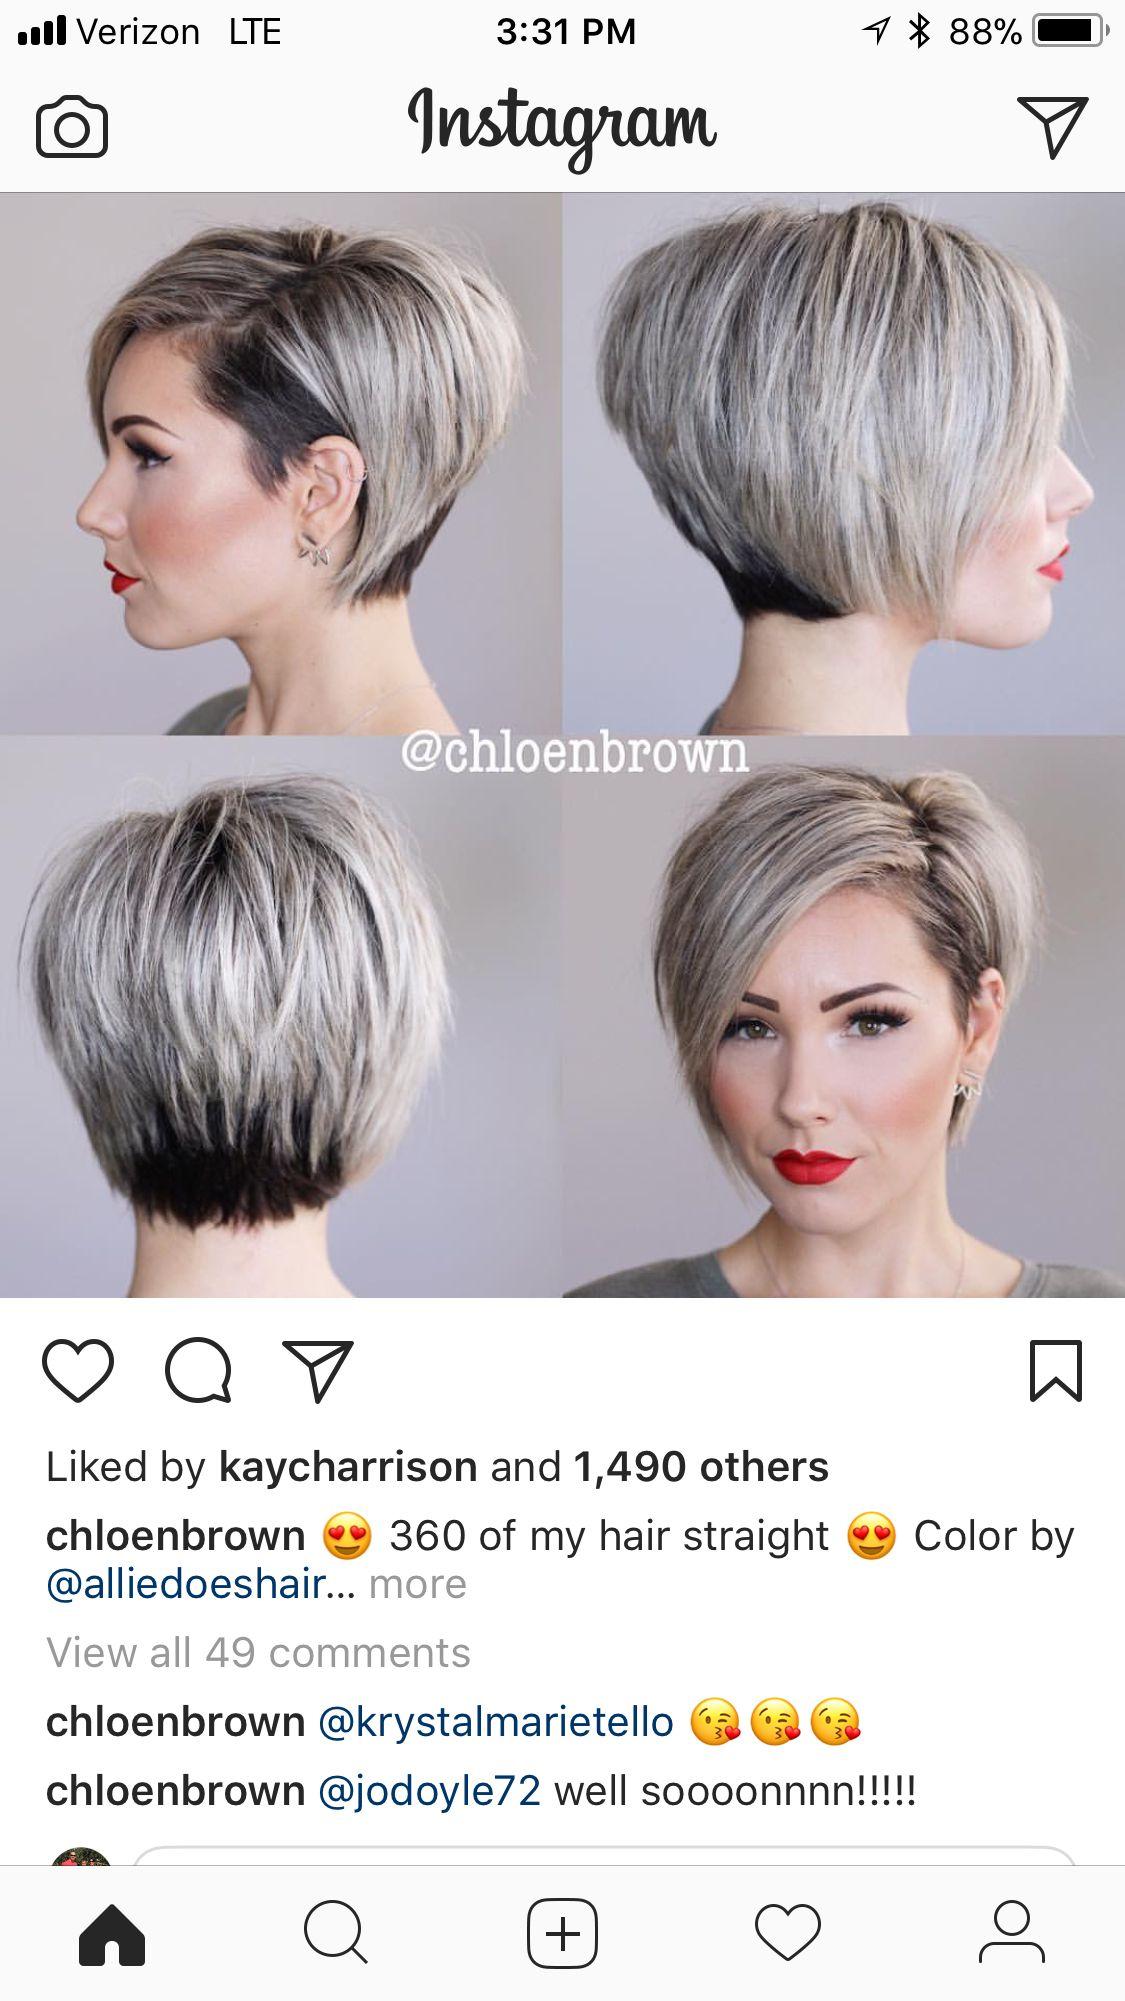 Pin Von Jaime Defendorf Foster Auf Hair Kurze Haare Stylen Haare Stylen Kurzhaarschnitte